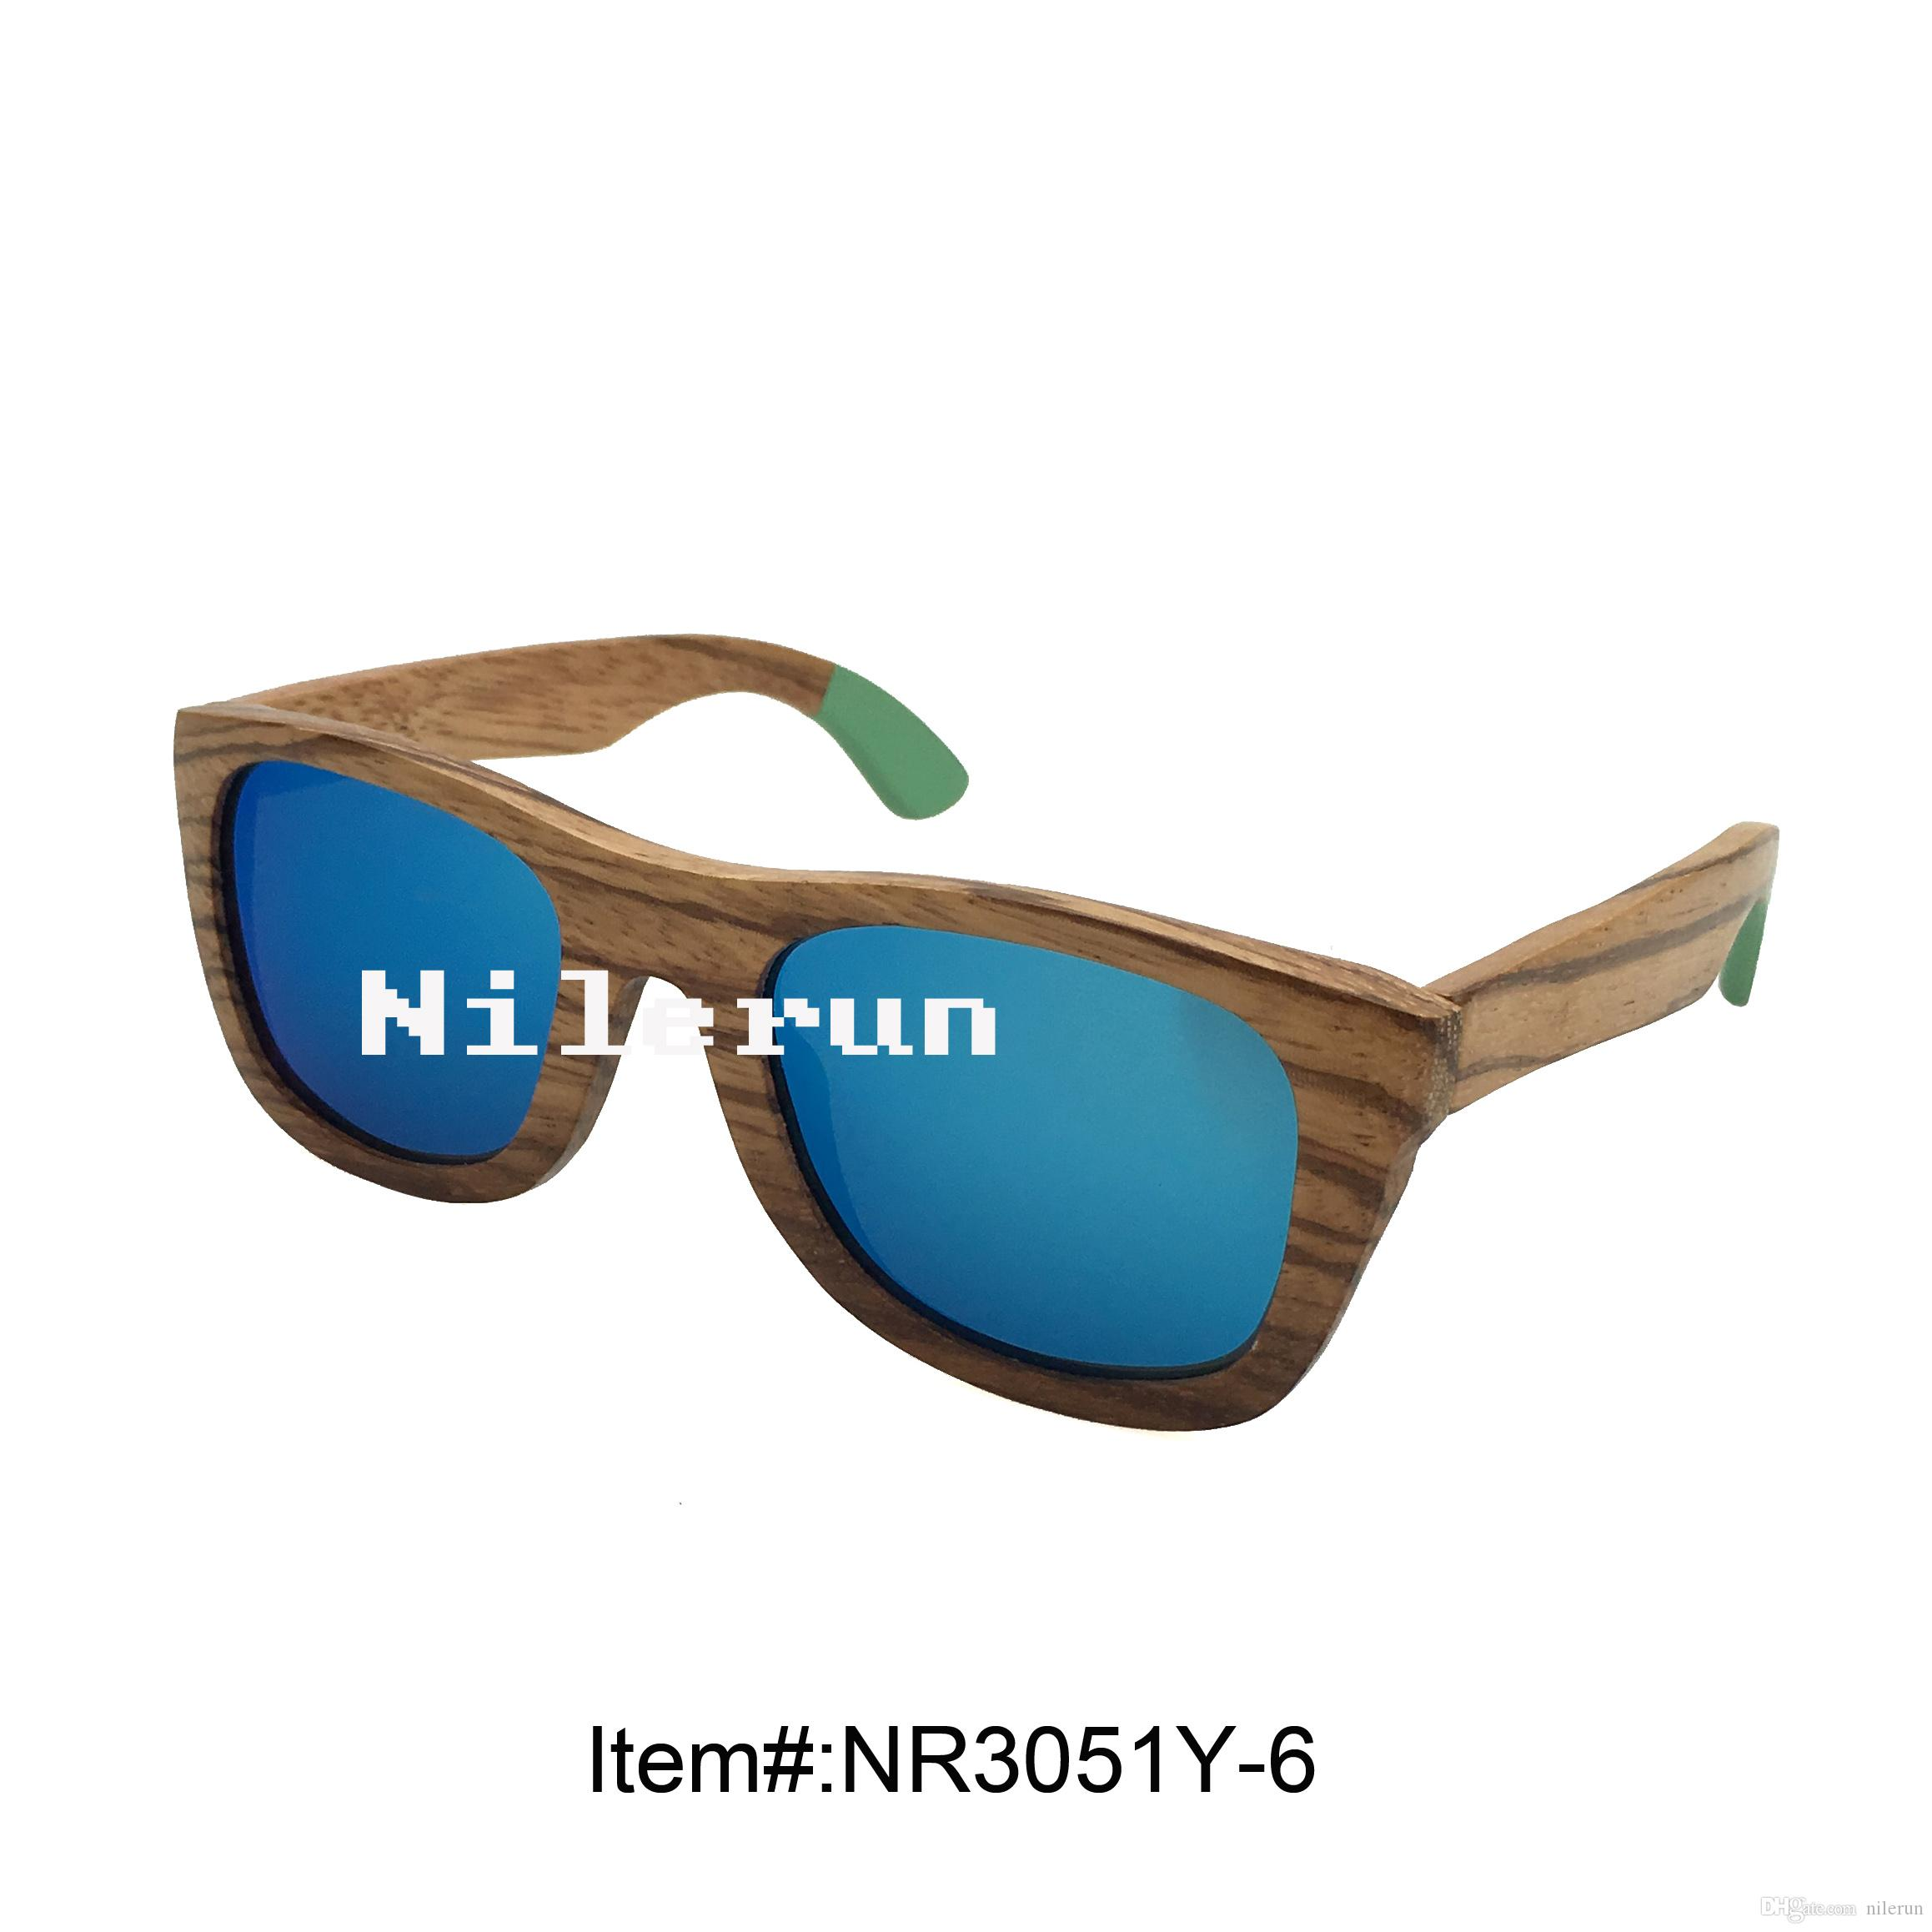 4e5c3b0ee2b Fashion Blue Polarized Mirror Lens Zebra Wood Sunglasses with Green ...